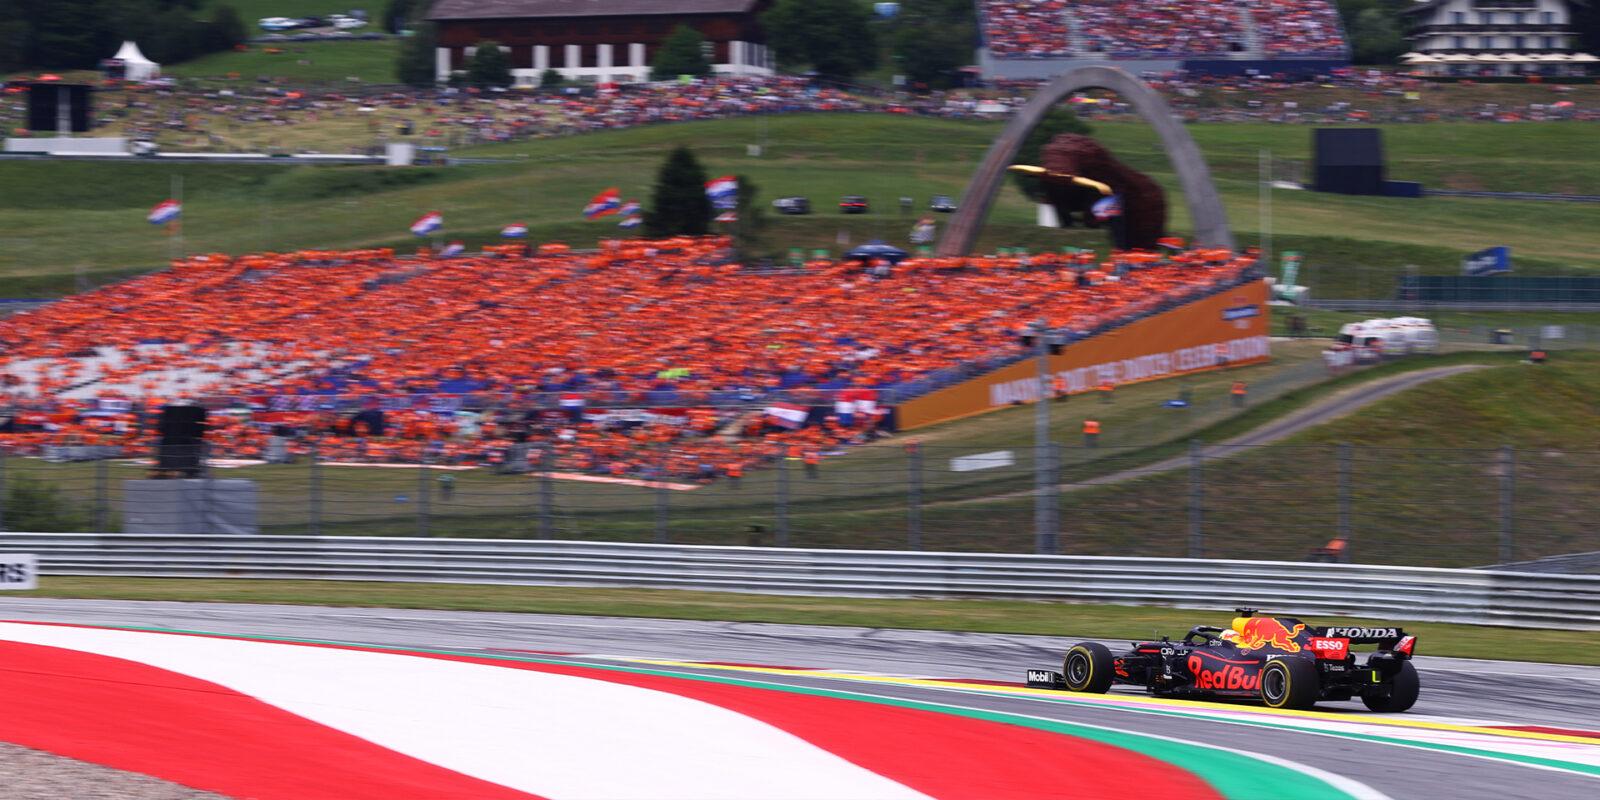 V Rakousku dominoval Verstappen, Hamilton až čtvrtý